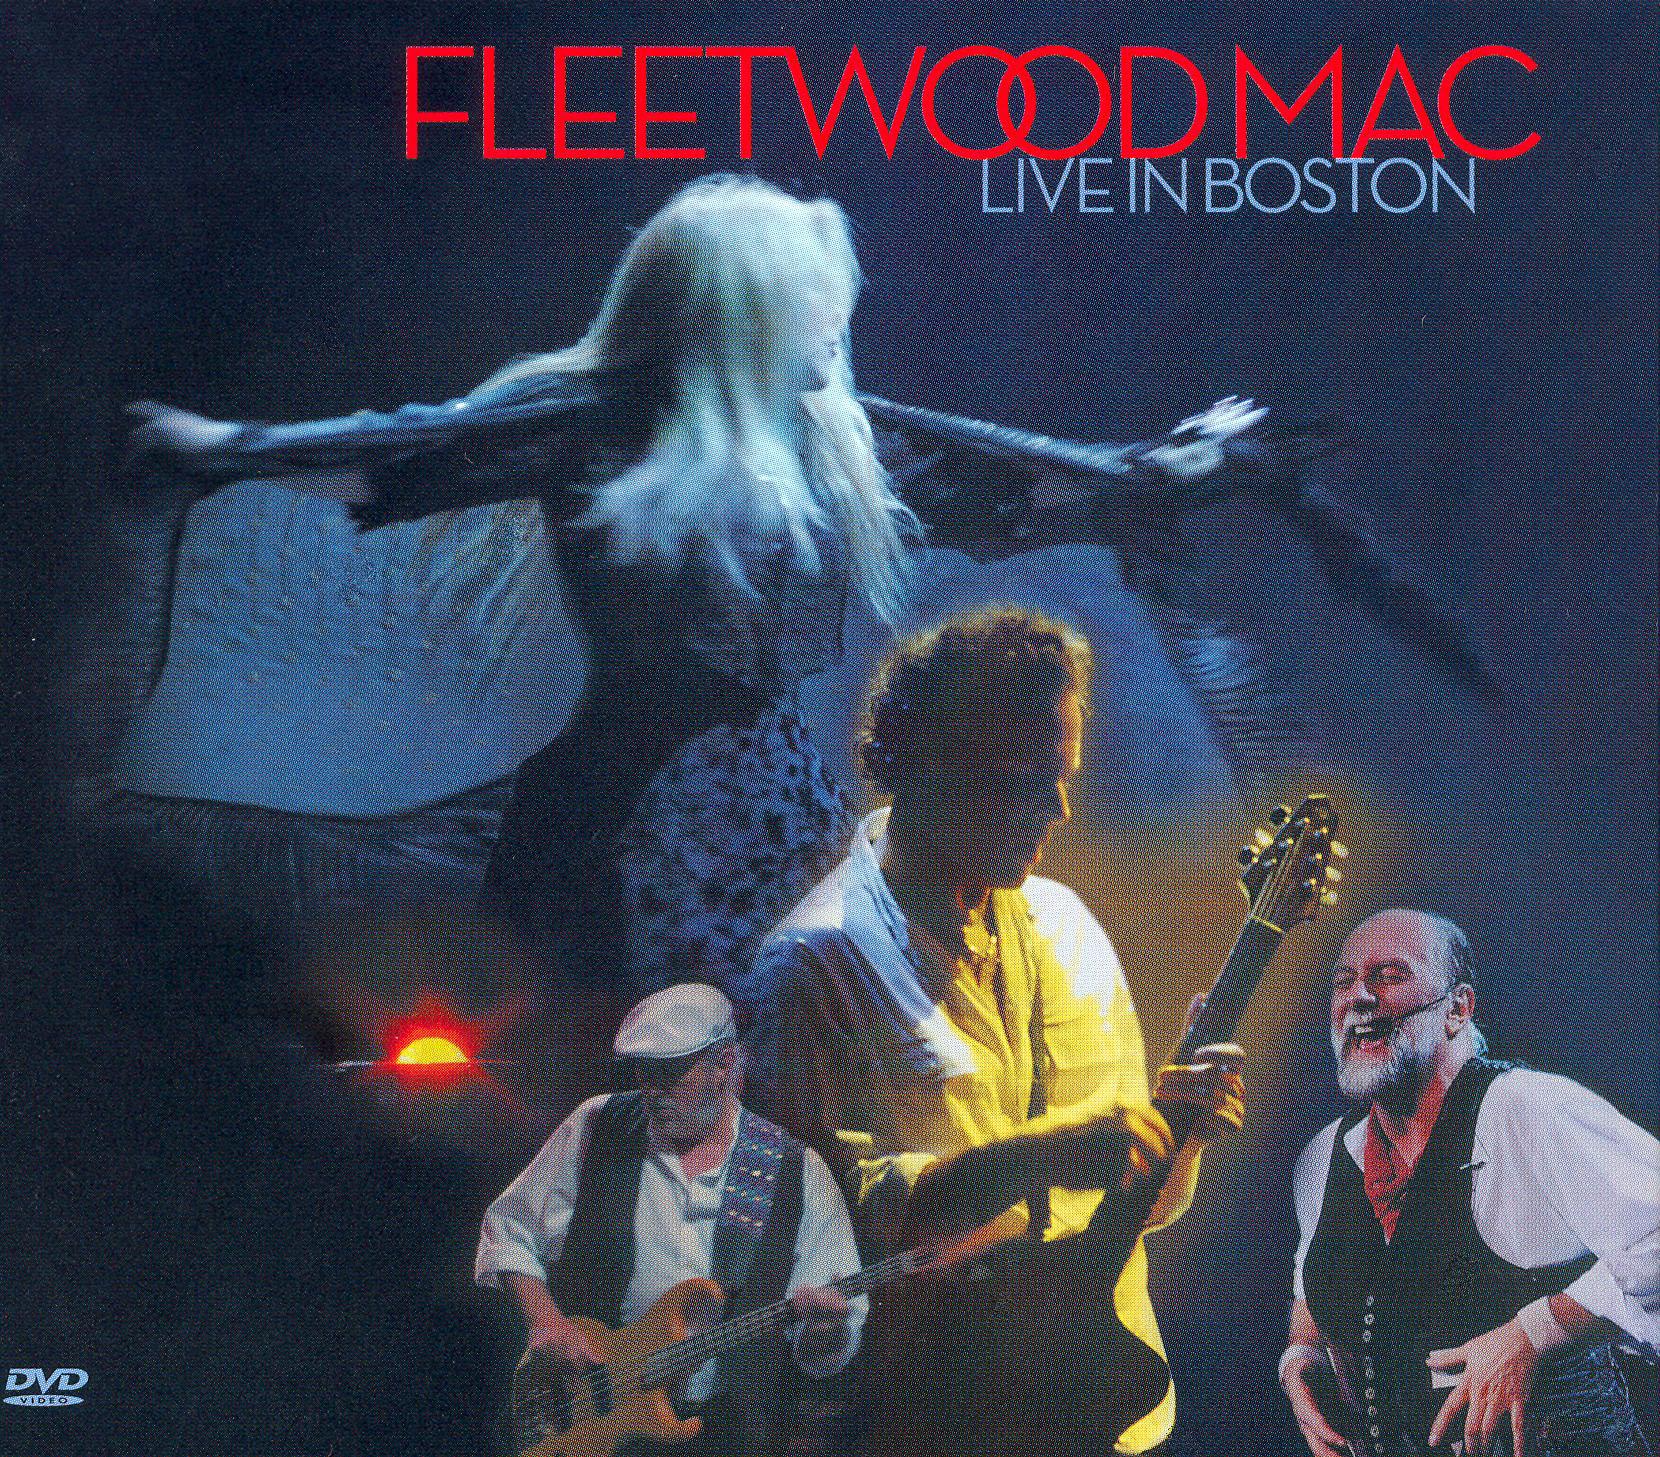 Fleetwood Mac: Live in Boston